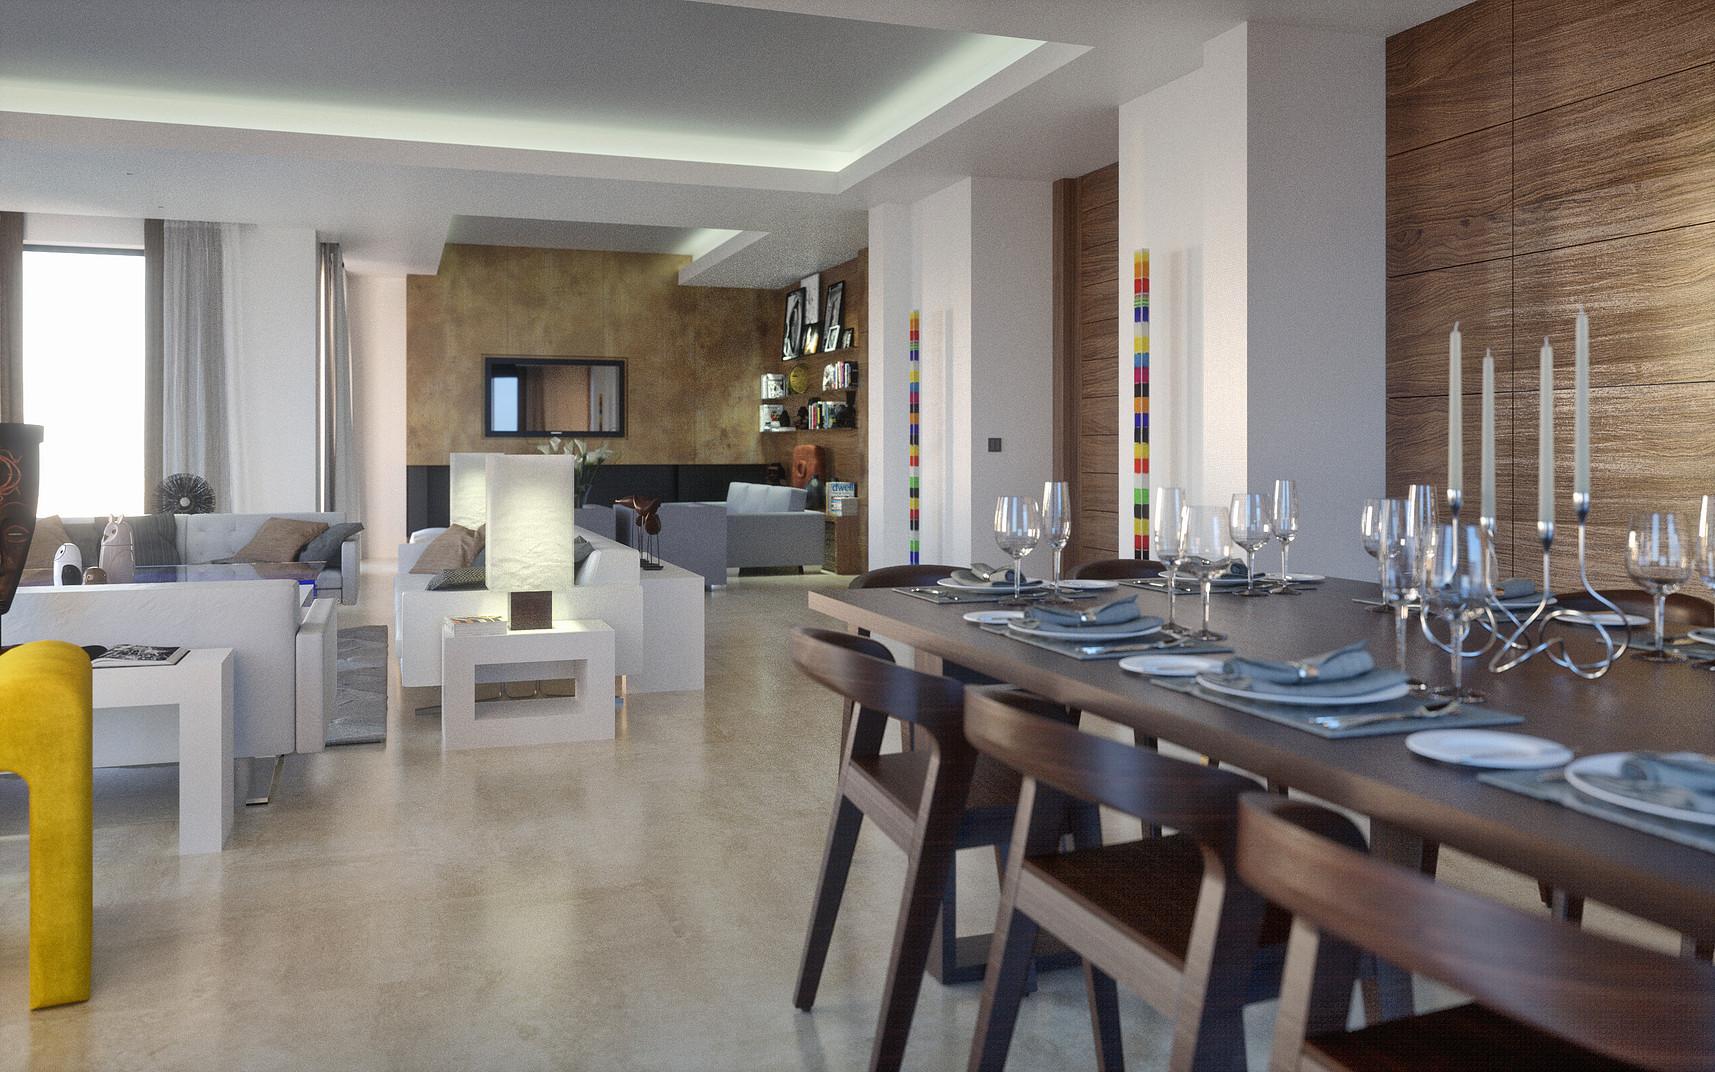 Grevillia Villa |  Luc Svetchine | Cote D'Azur, France